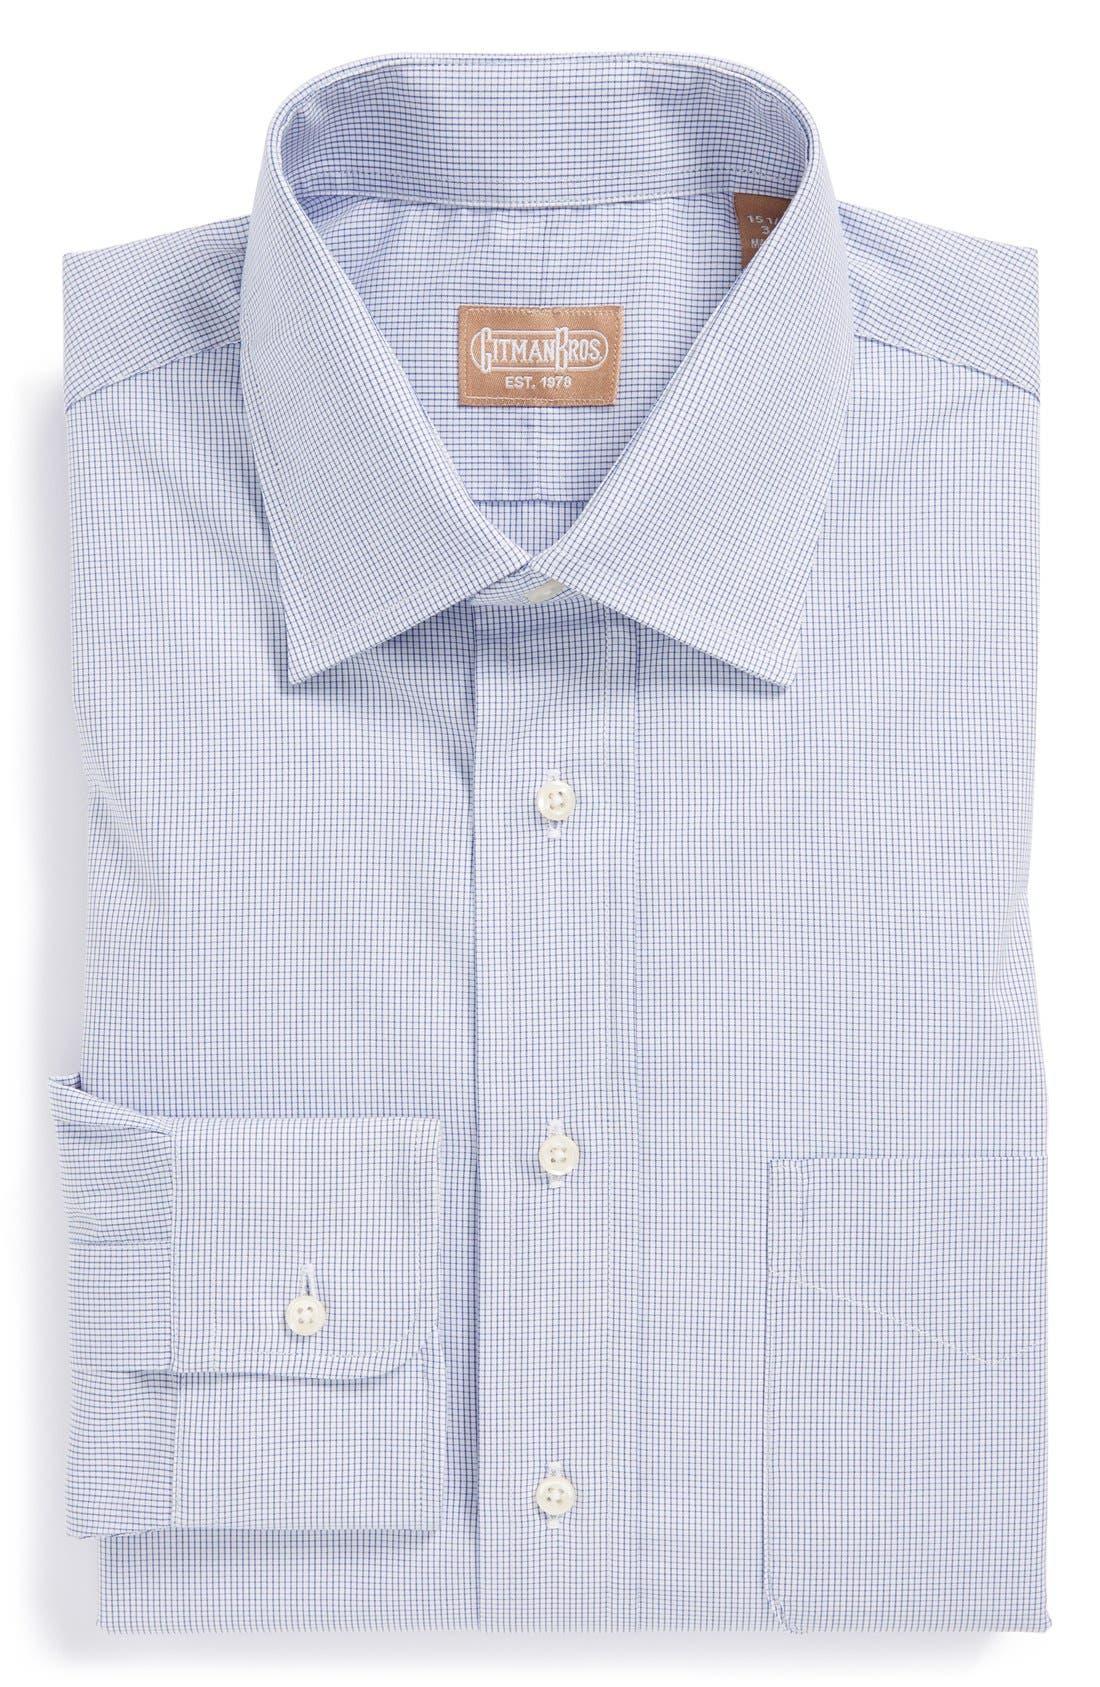 Alternate Image 1 Selected - Gitman Regular Fit Mini Check Cotton English Spread Collar Dress Shirt